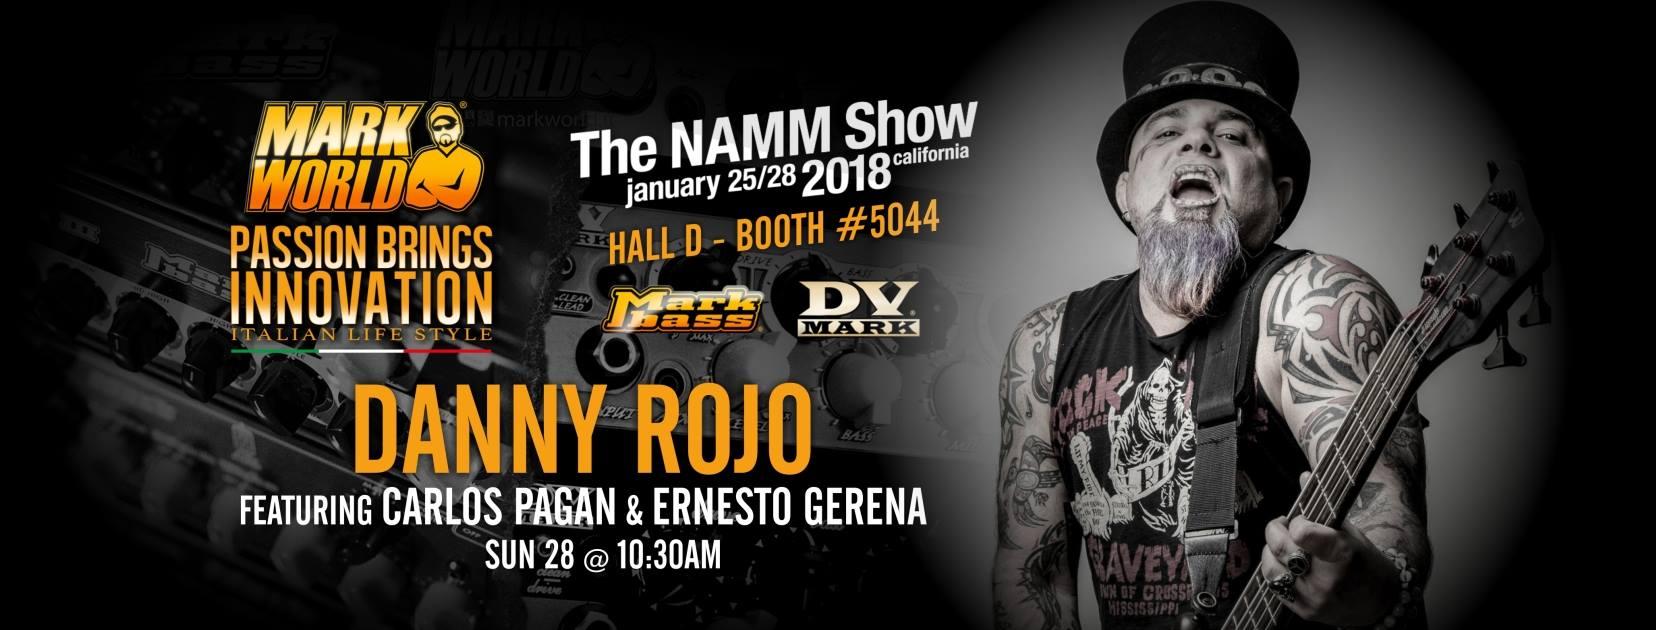 Danny Rojo show Namm 2018